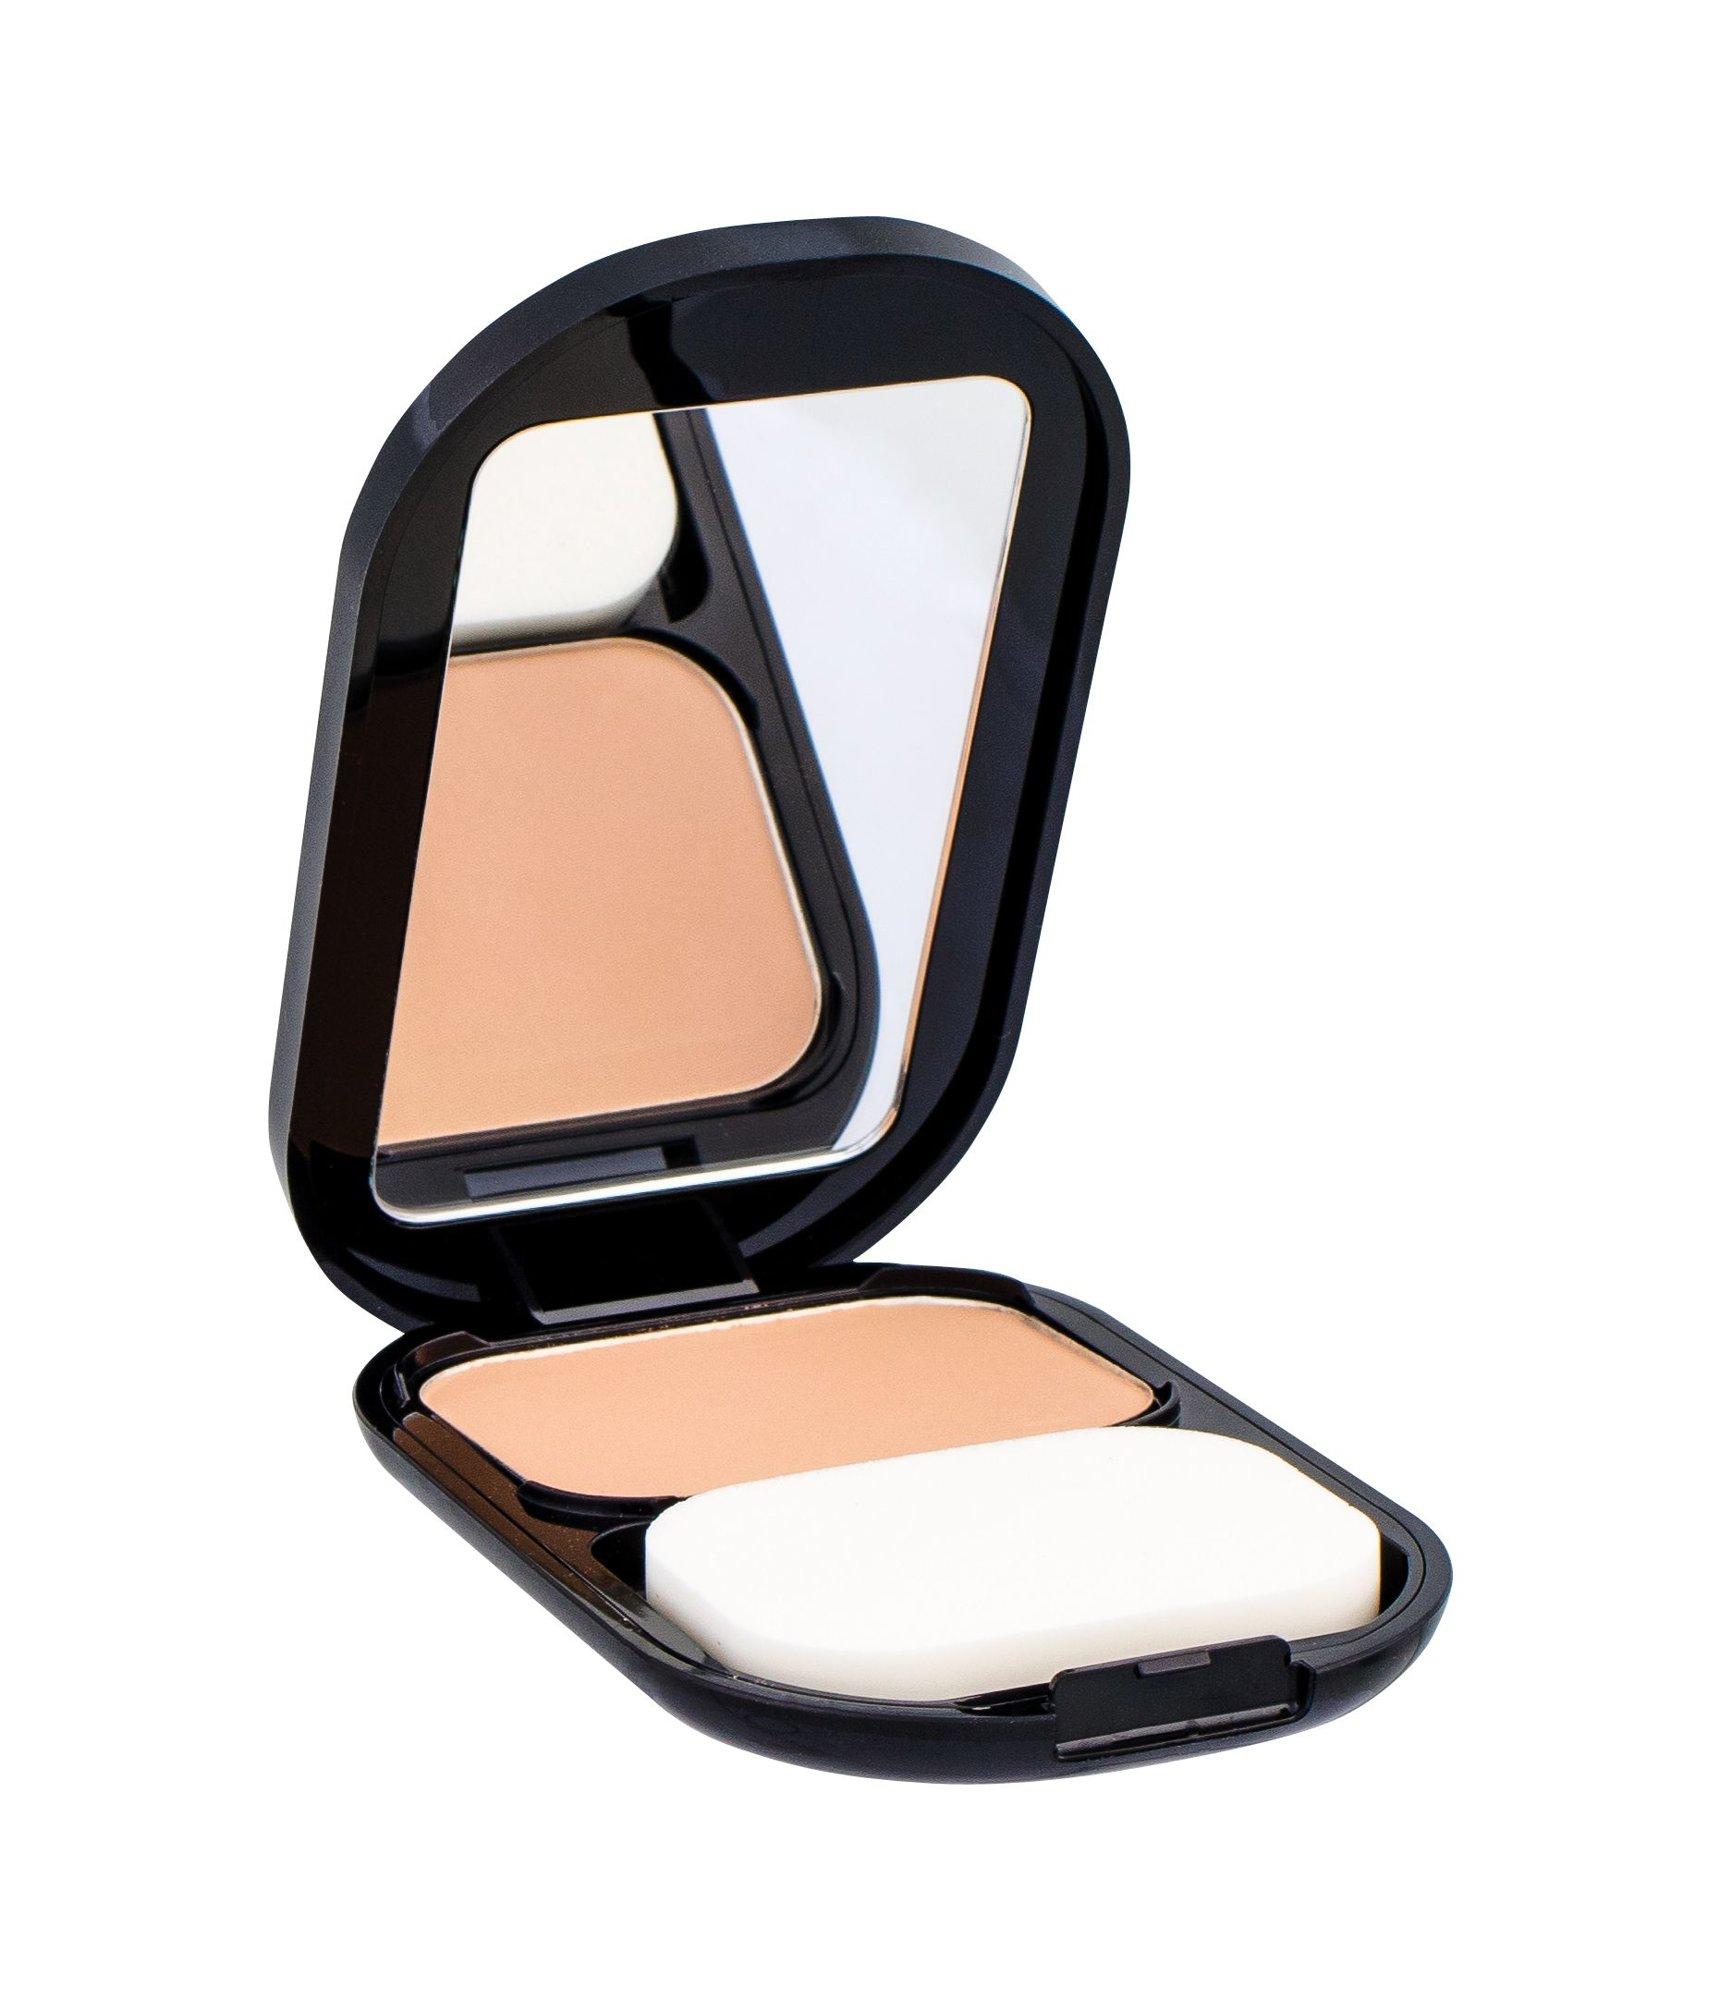 Max Factor Facefinity Makeup 10ml 003 Natural